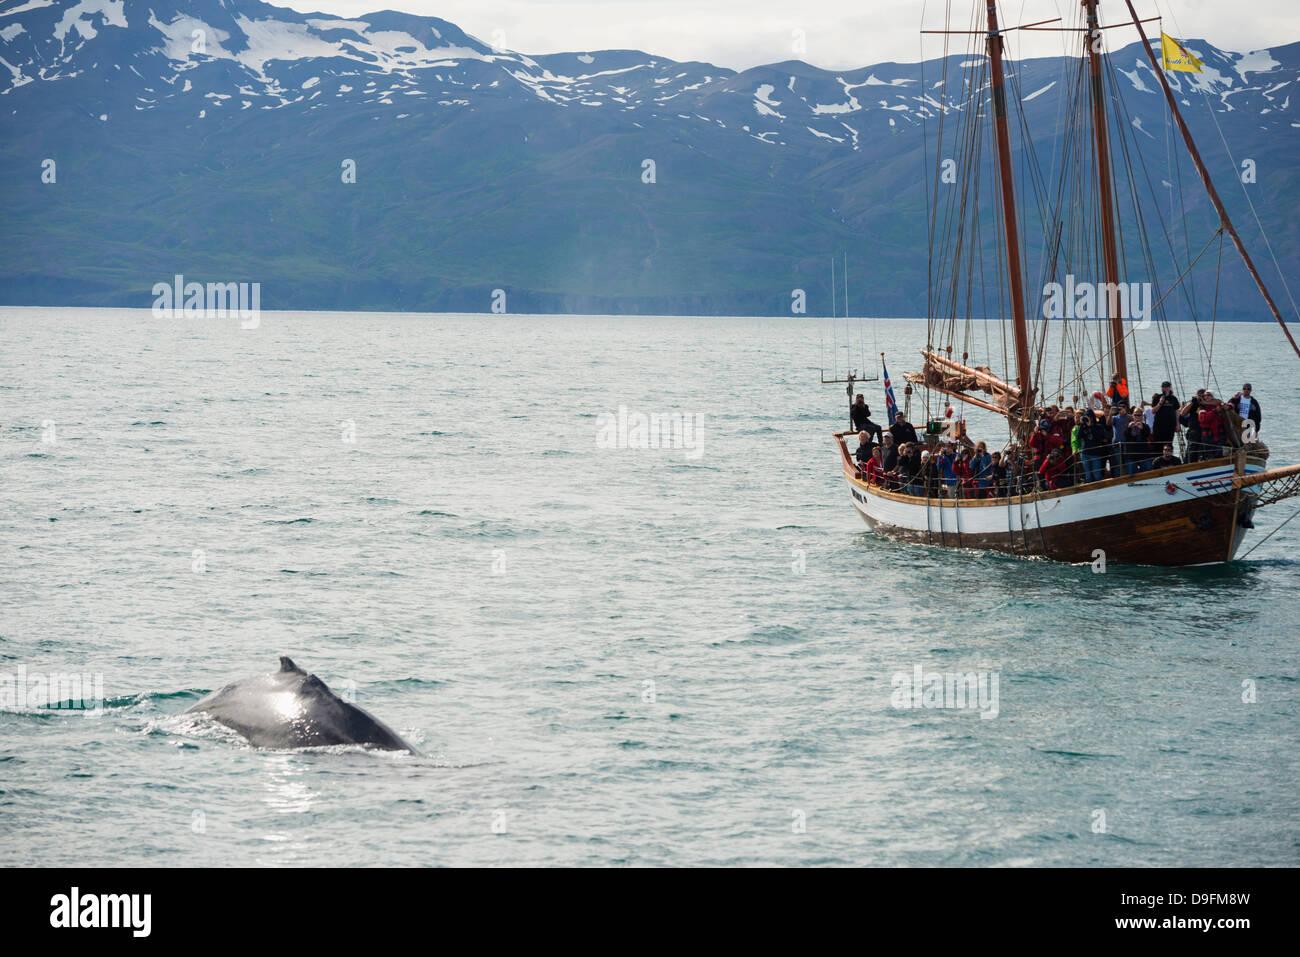 Whale watching tour, Husavik, Northern Region, Iceland, Polar Regions - Stock Image